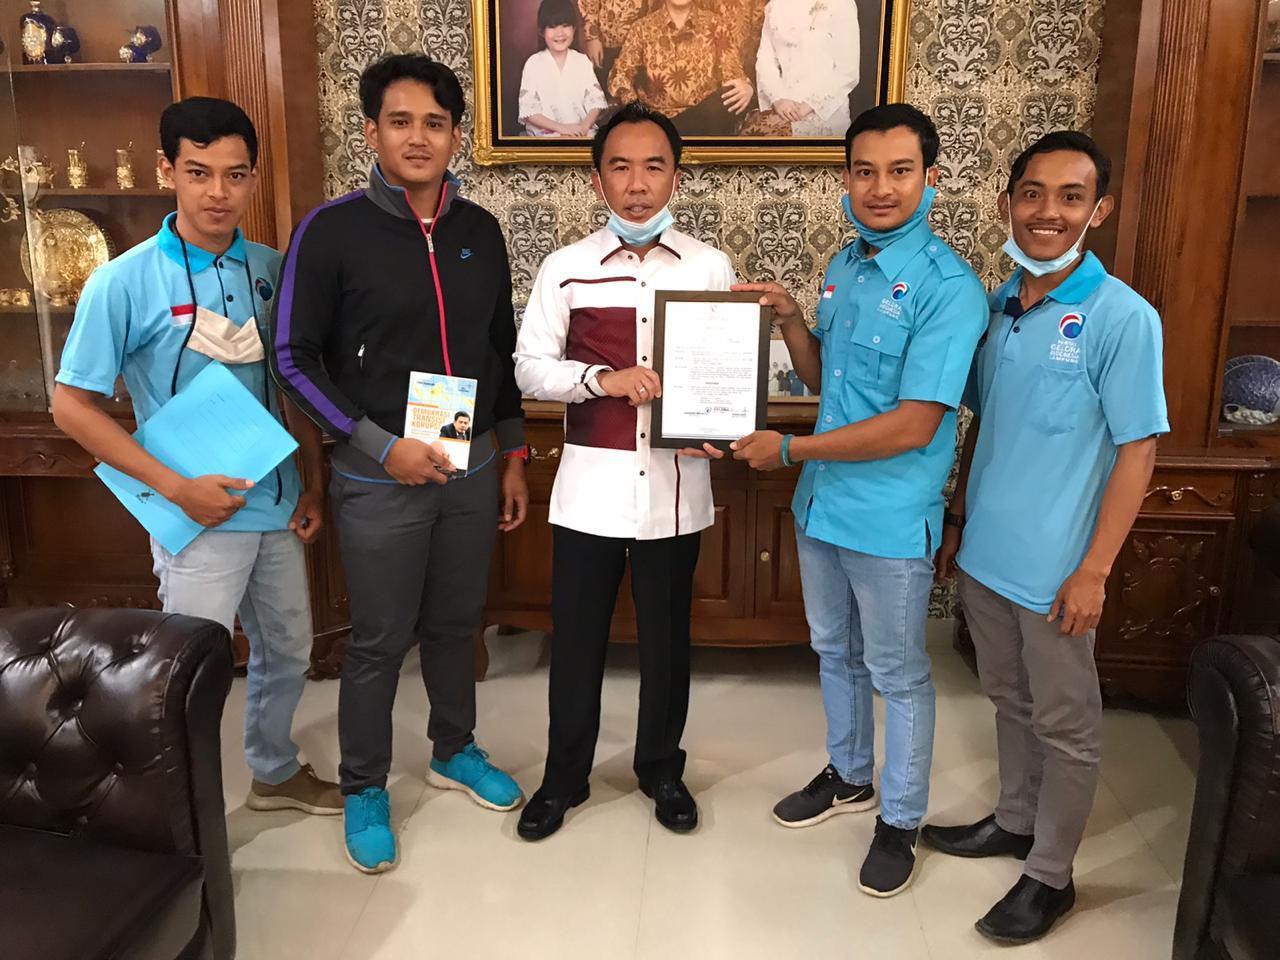 Berikan surat Rekomendasi ke Adipati, Partai Gelora Way Kanan usul 5 program pembangunan siap berkolaborasi